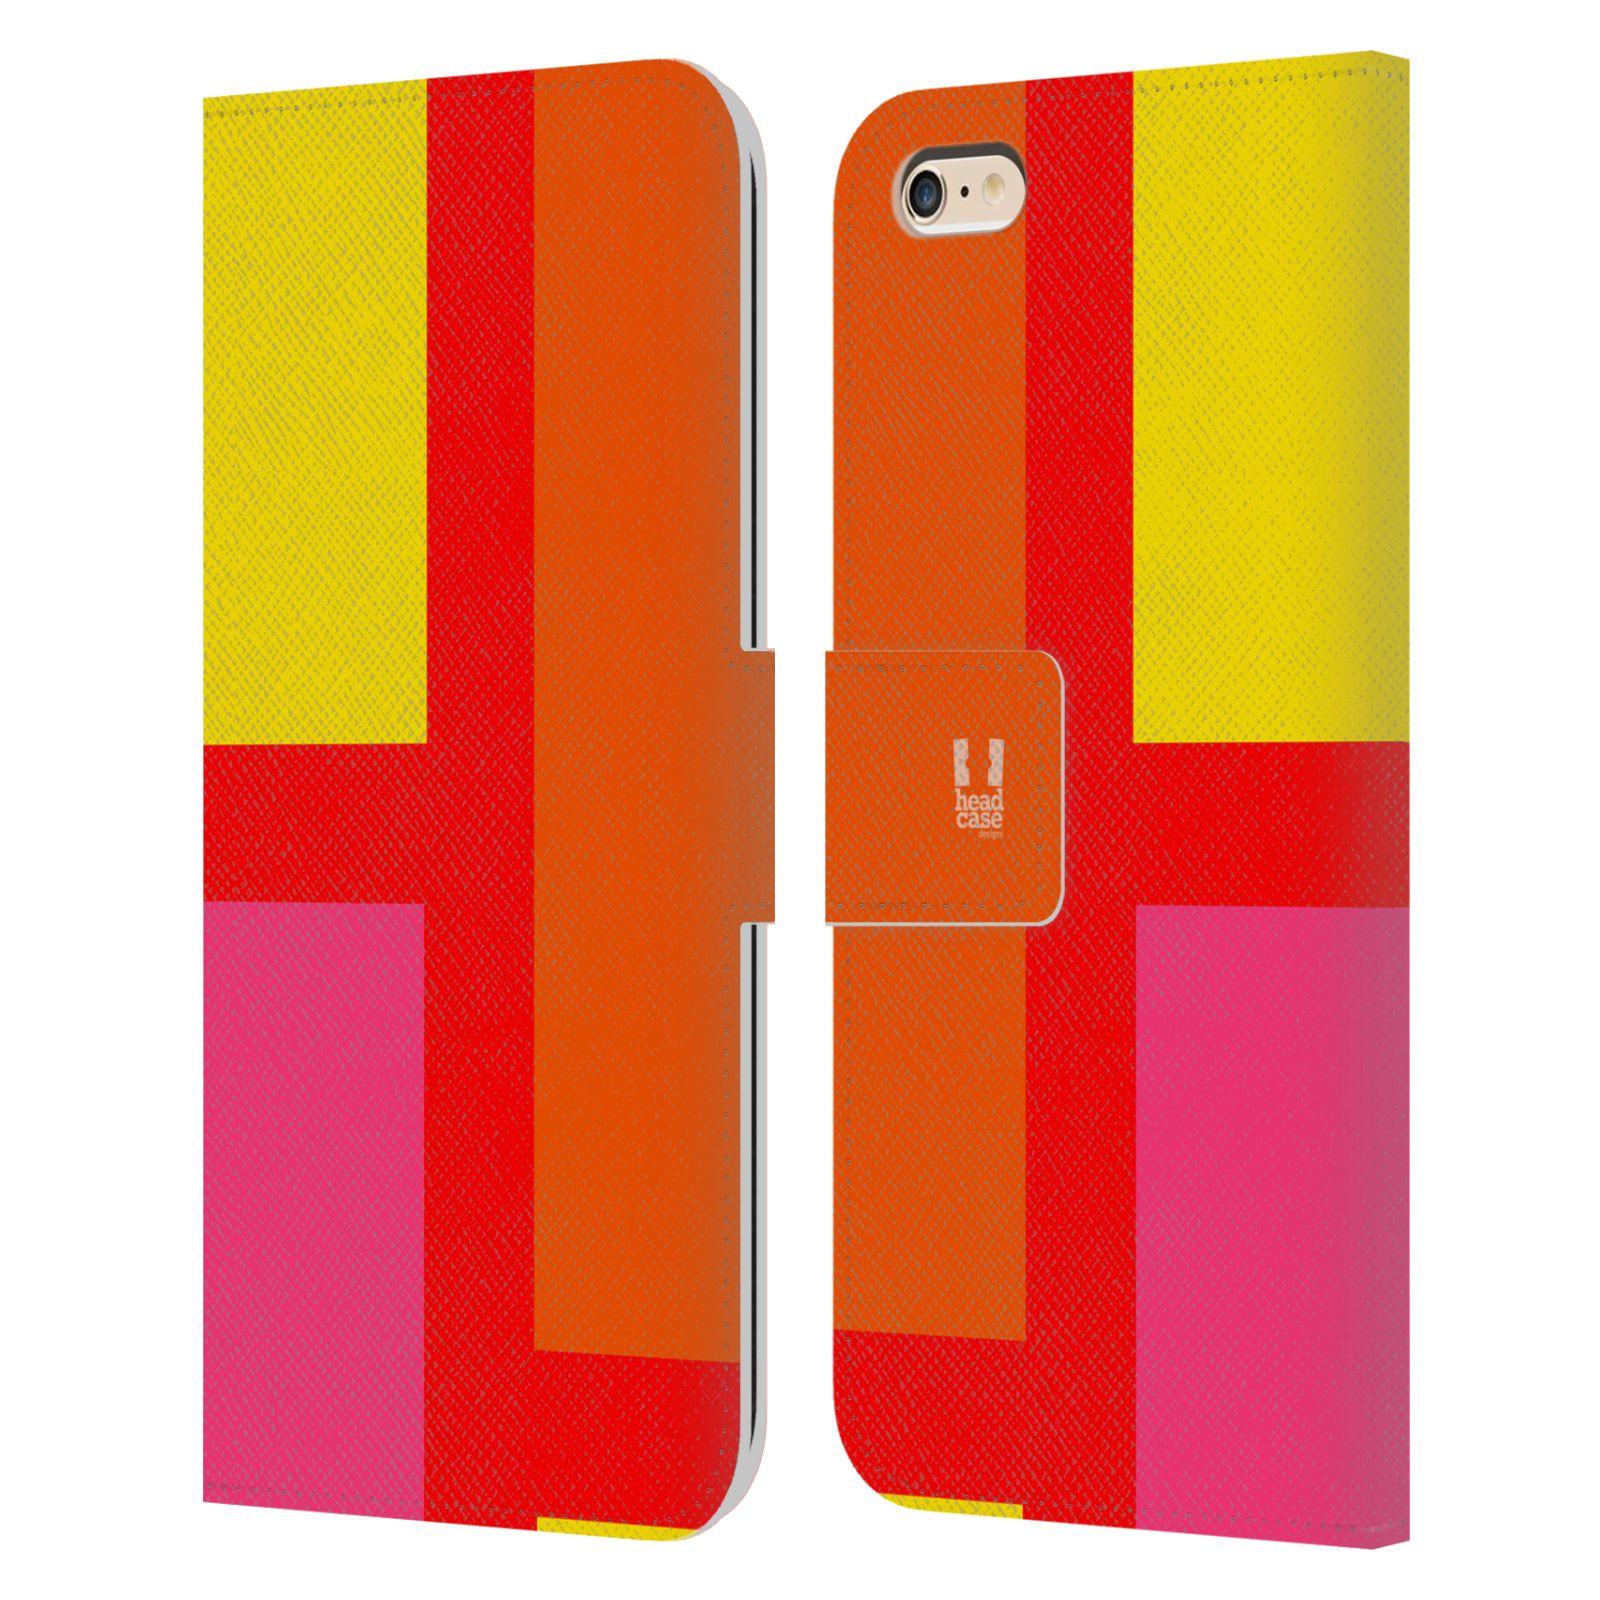 HEAD CASE Flipové pouzdro pro mobil Apple Iphone 6 PLUS/6S PLUS barevné tvary oranžová ulice